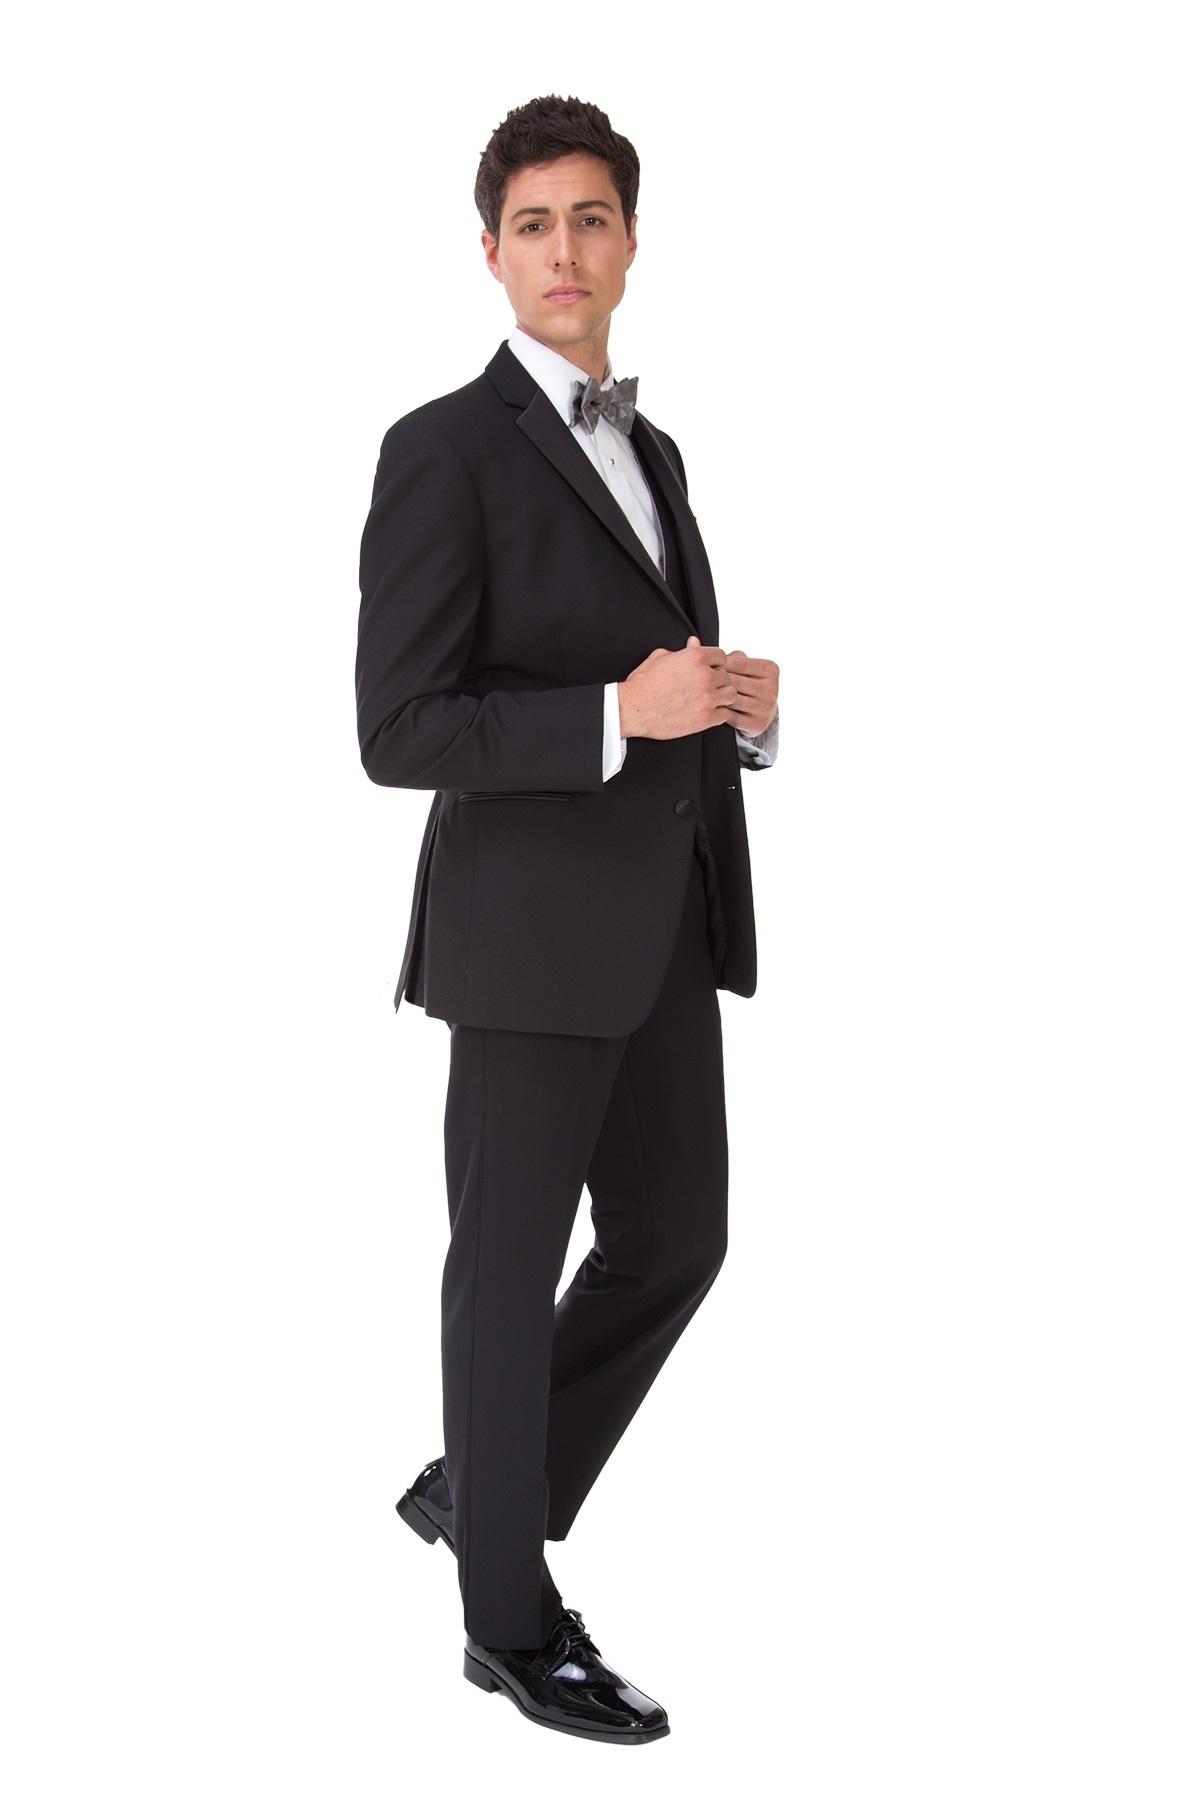 MFWtux.com - Black Ike Behar Parker Tuxedo